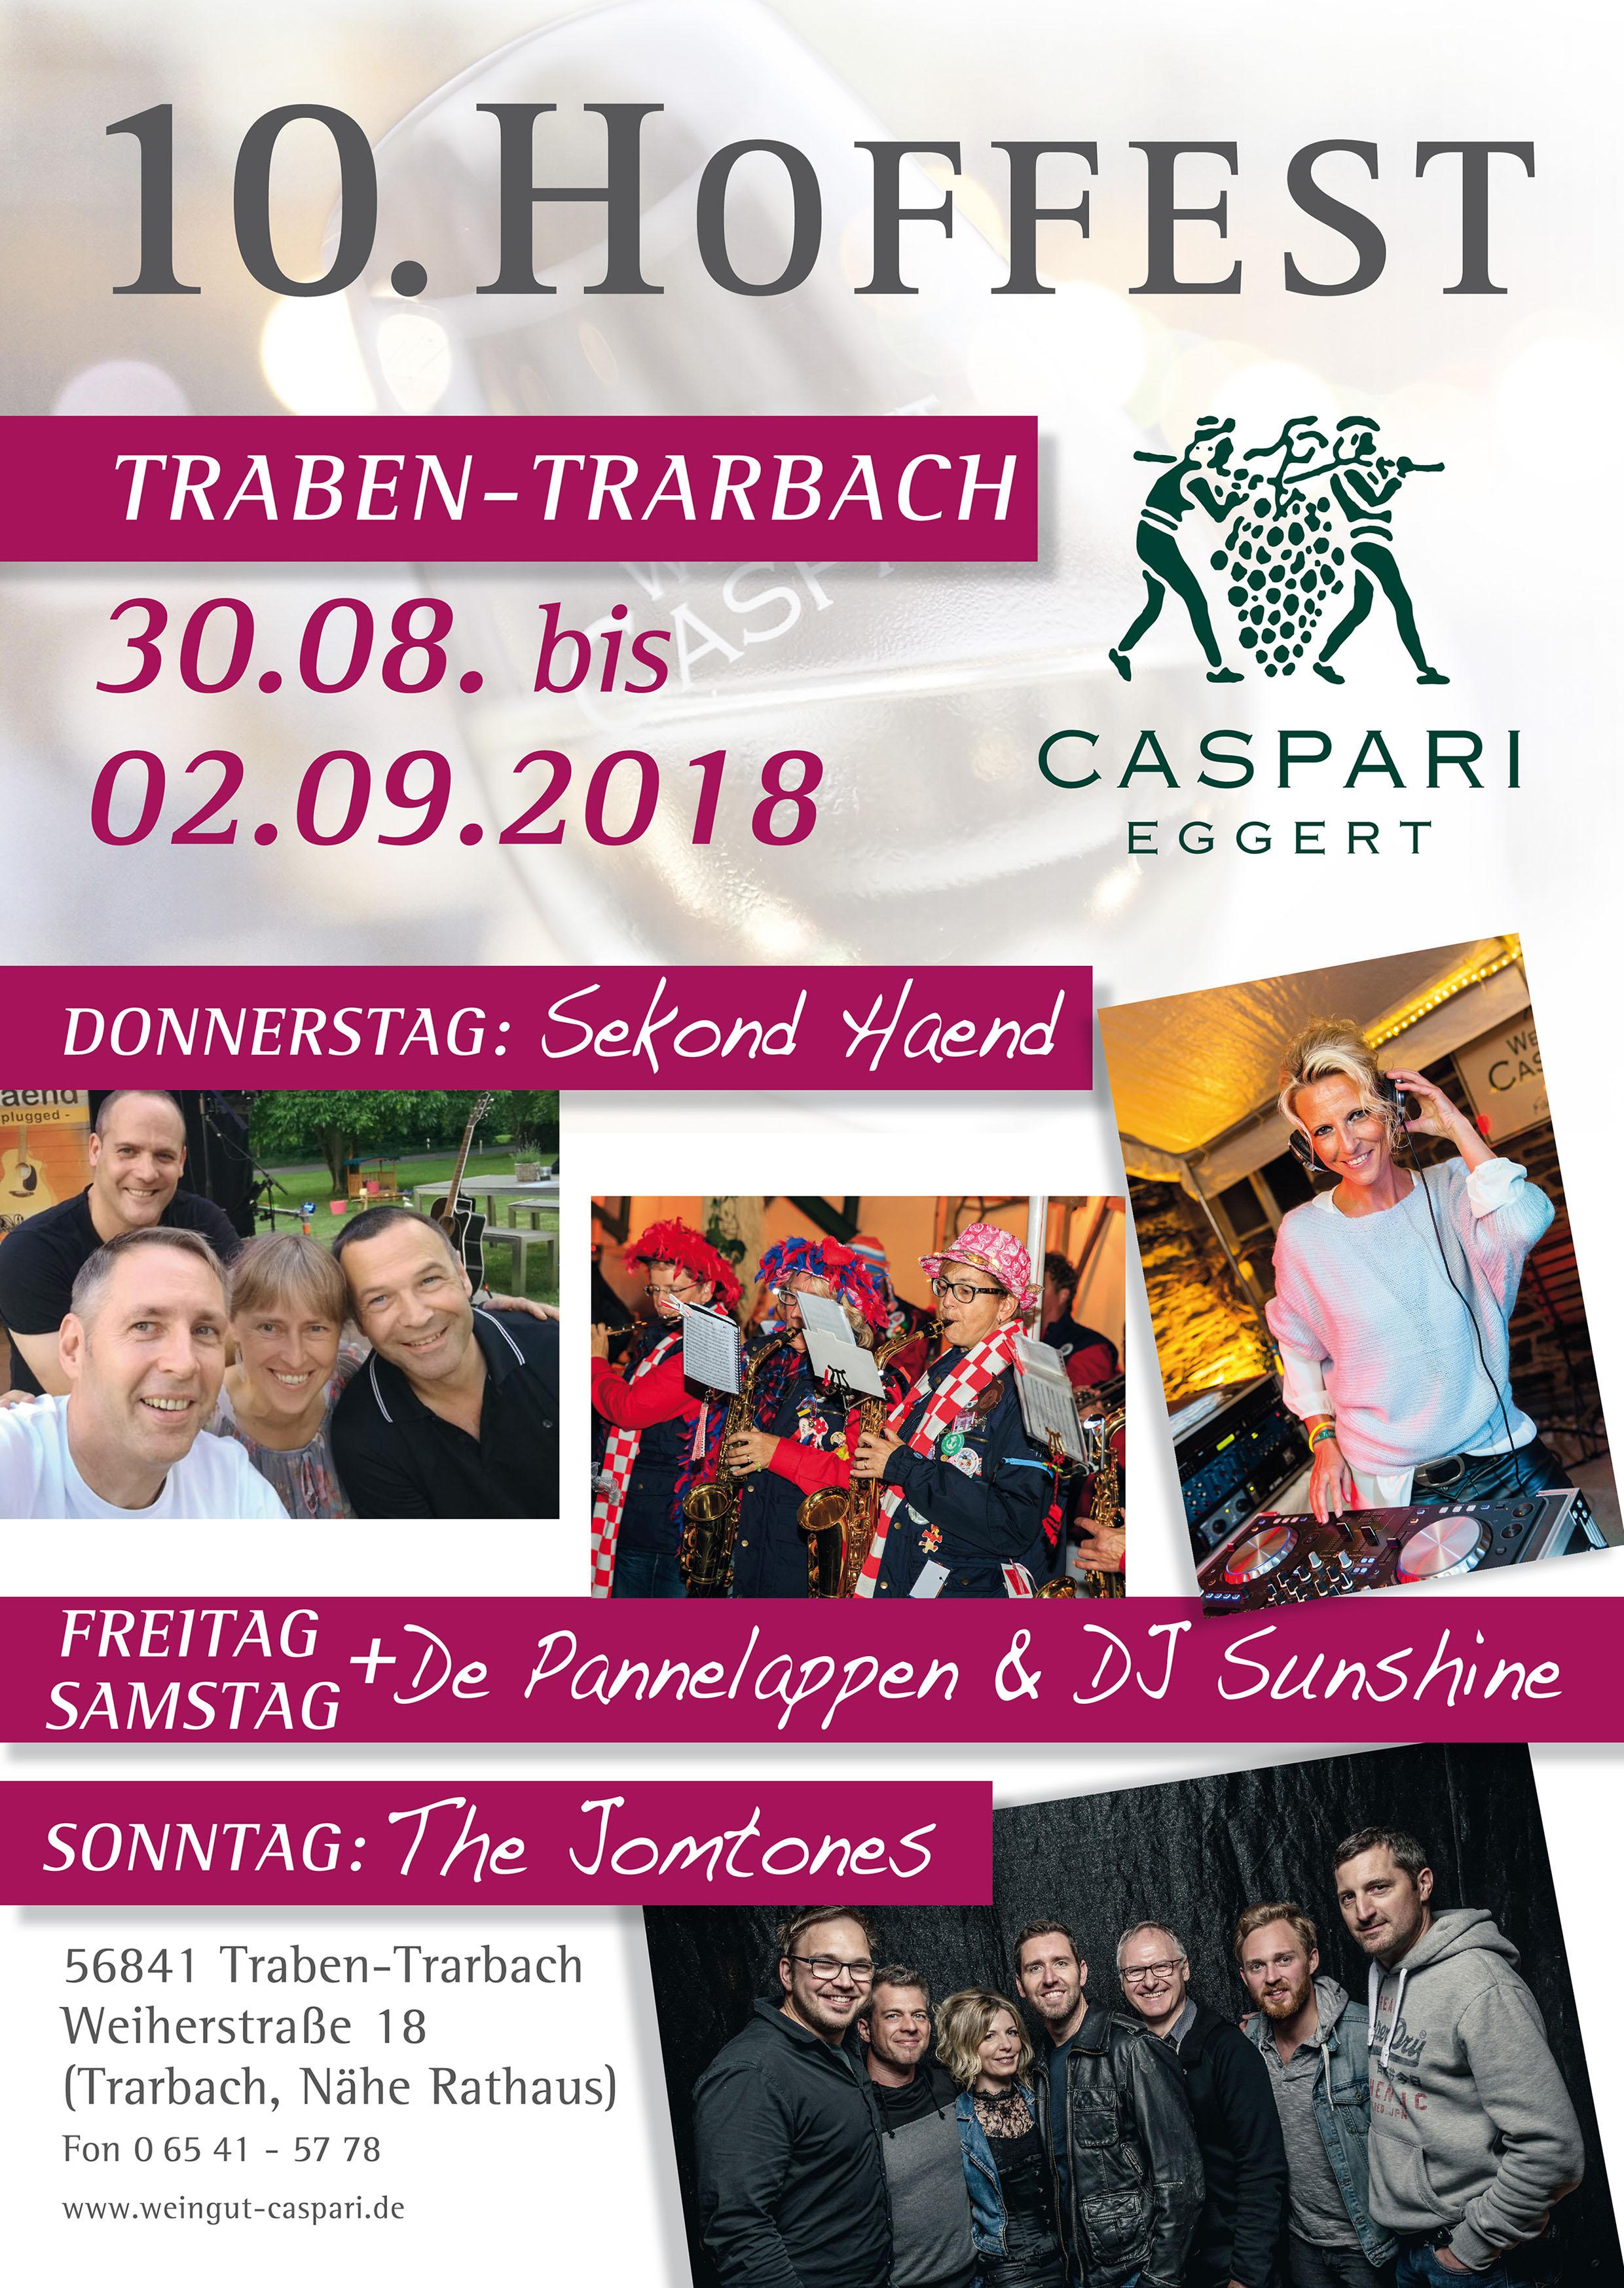 PPLA3_CaspariHoffest_2018 gerade_out.indd